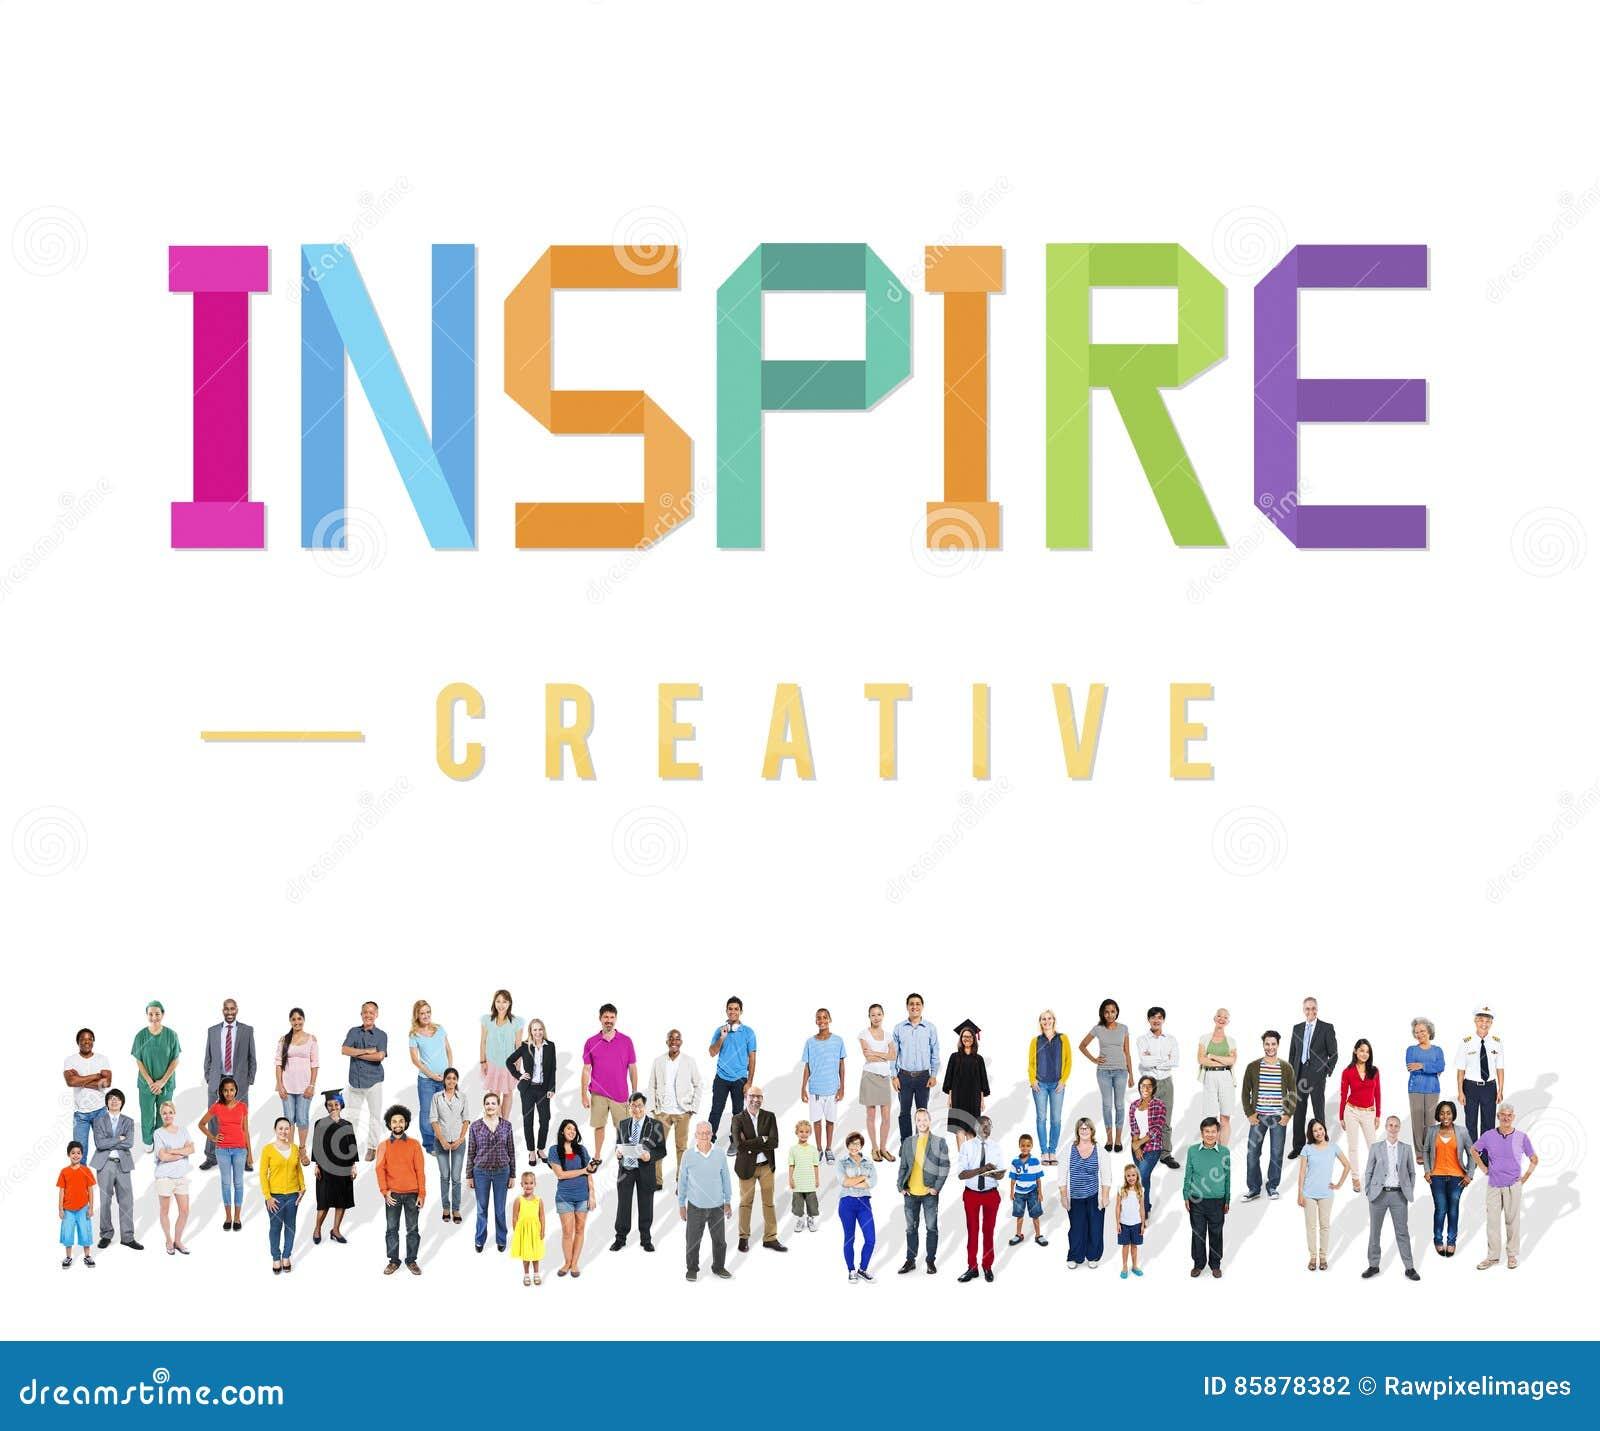 Inspire esperanzado creen que innove la aspiración Vision concepto